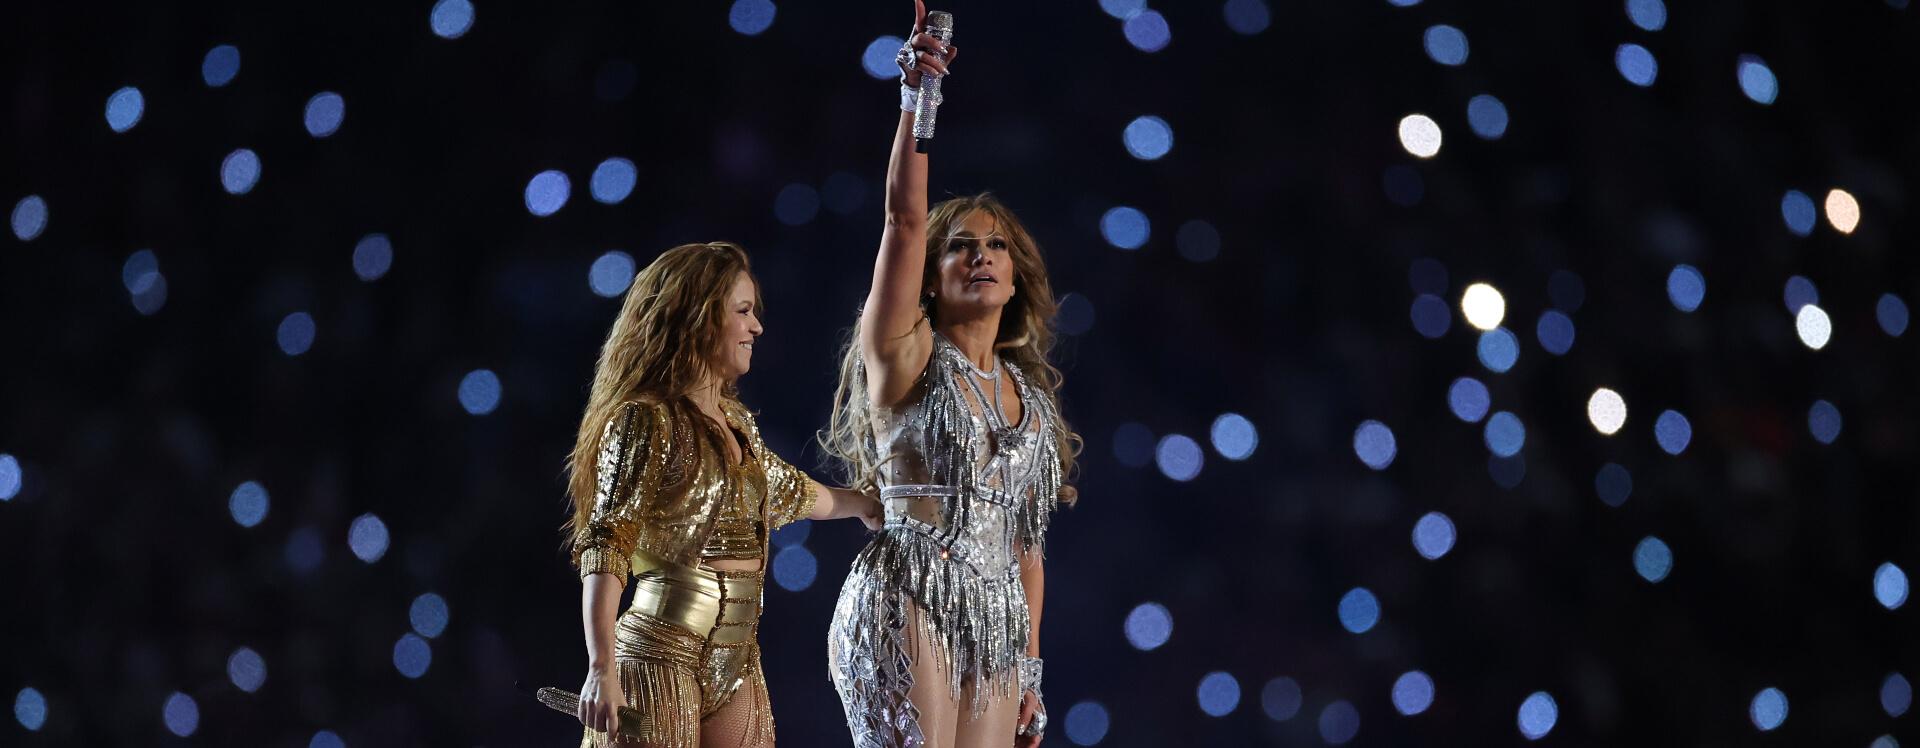 Super Bowl Halftime Jennifer Lopez And Shakira